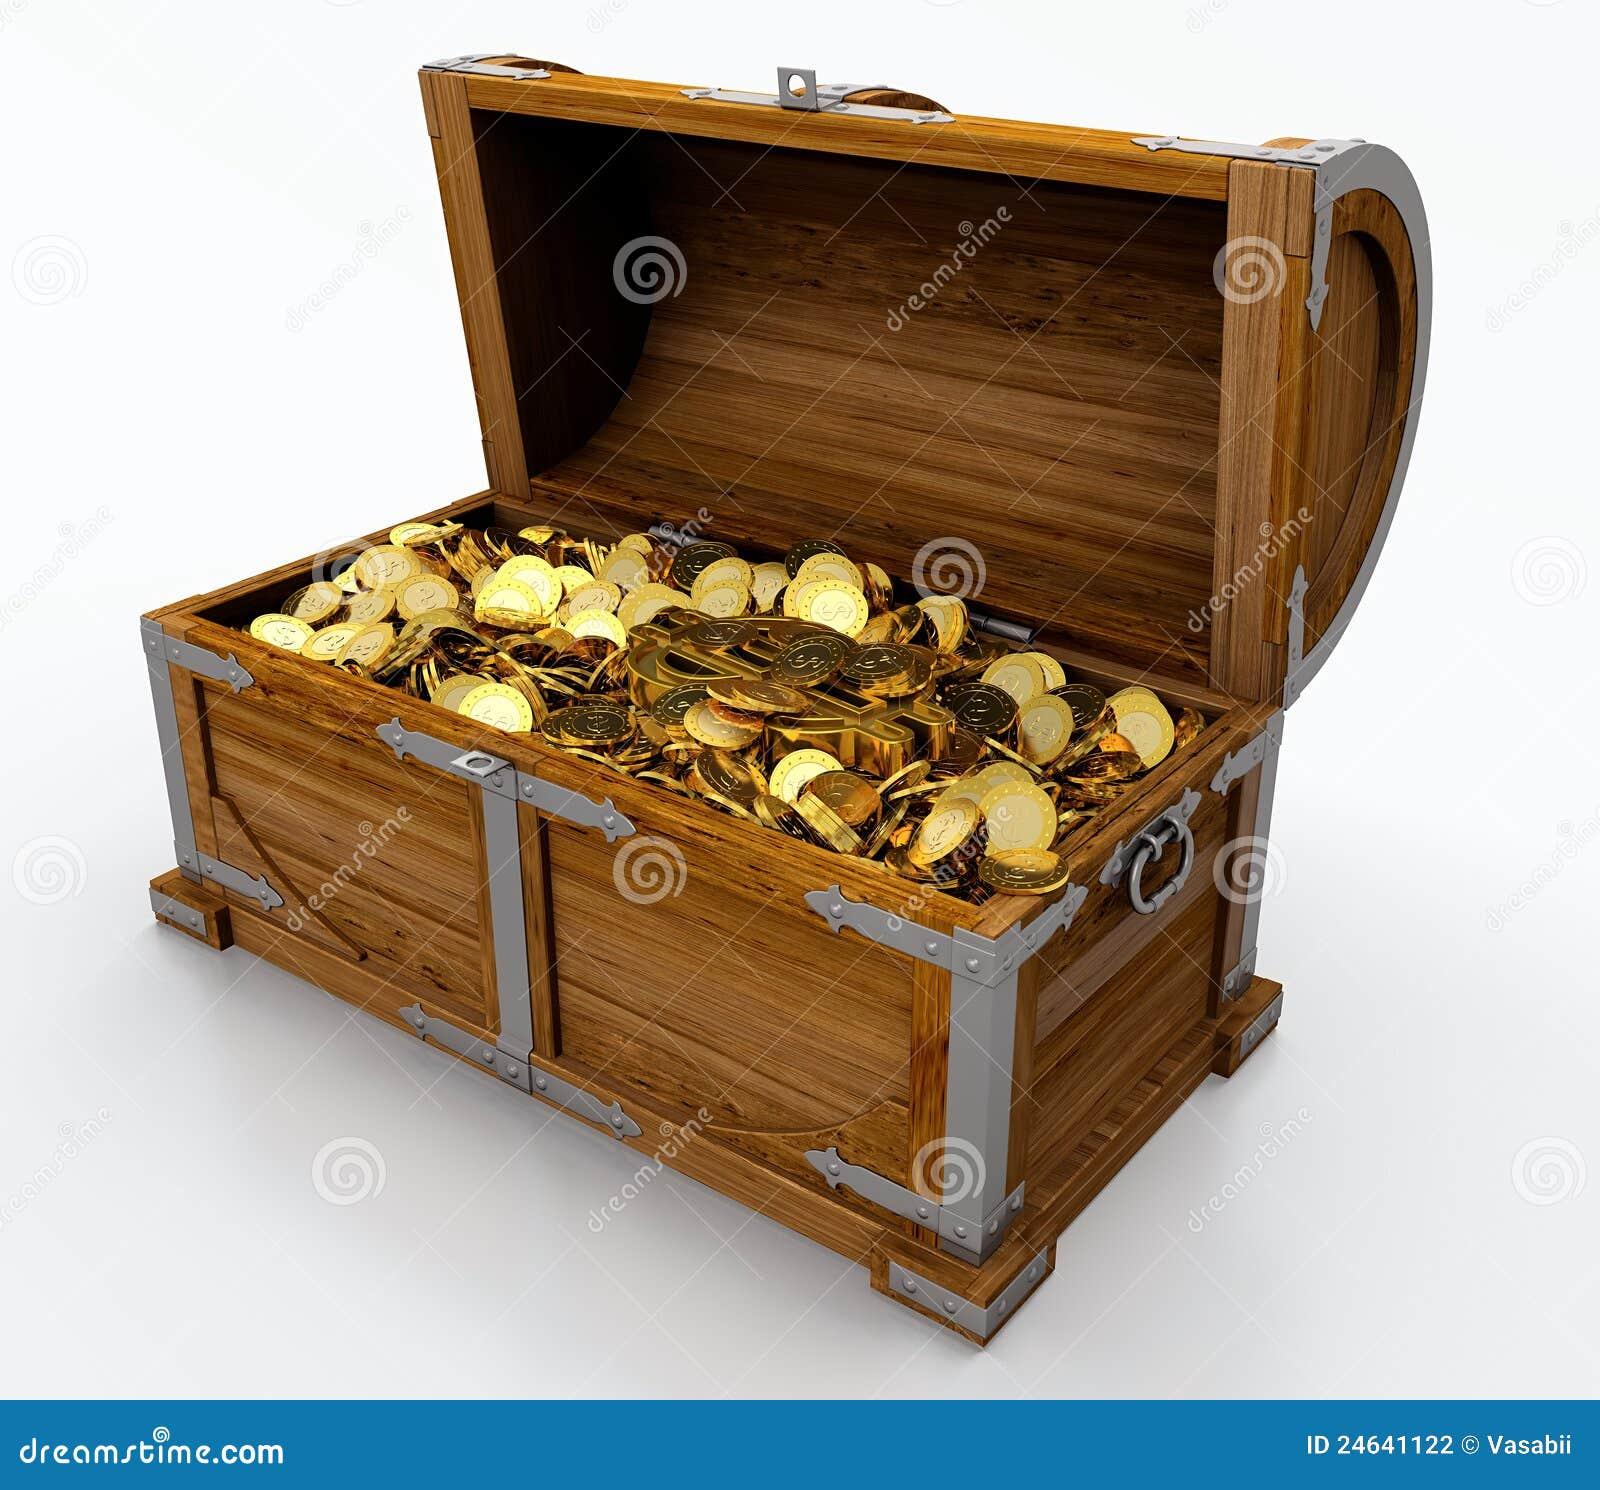 Treasure chest full of golden coins on white background.